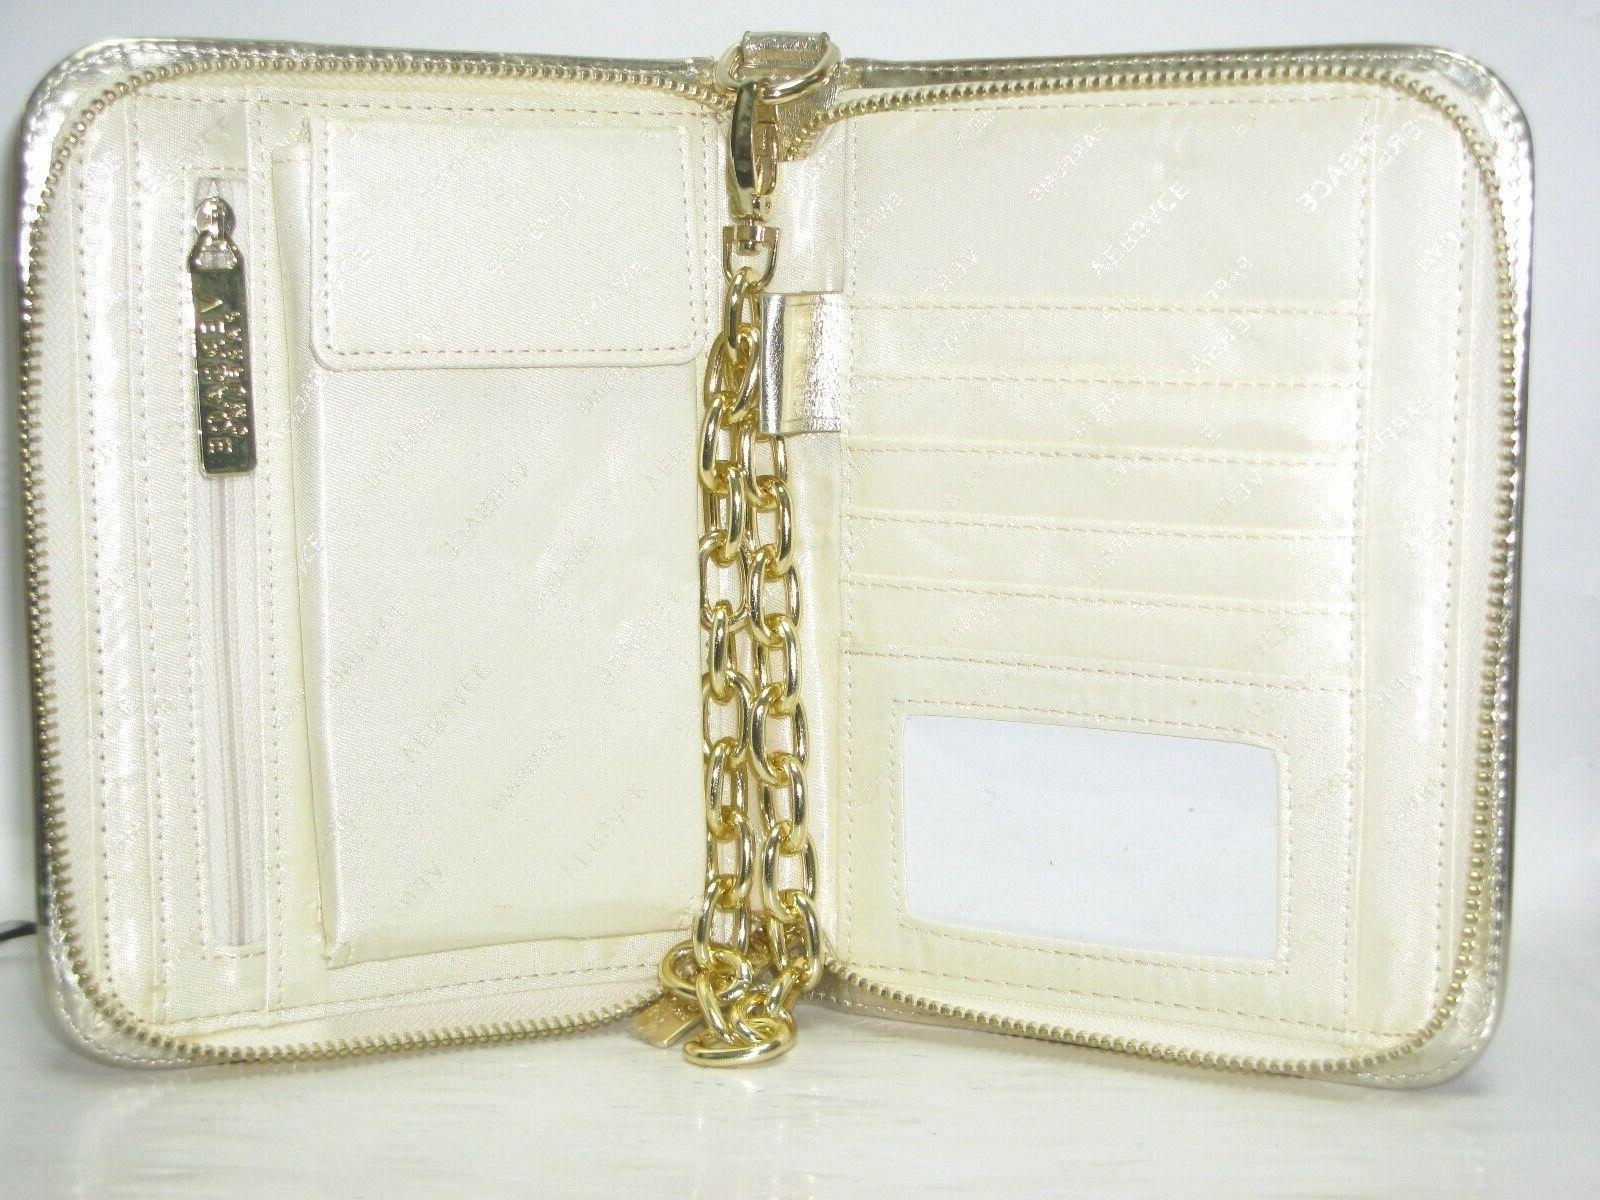 Versace EDT 3.4 oz Gift